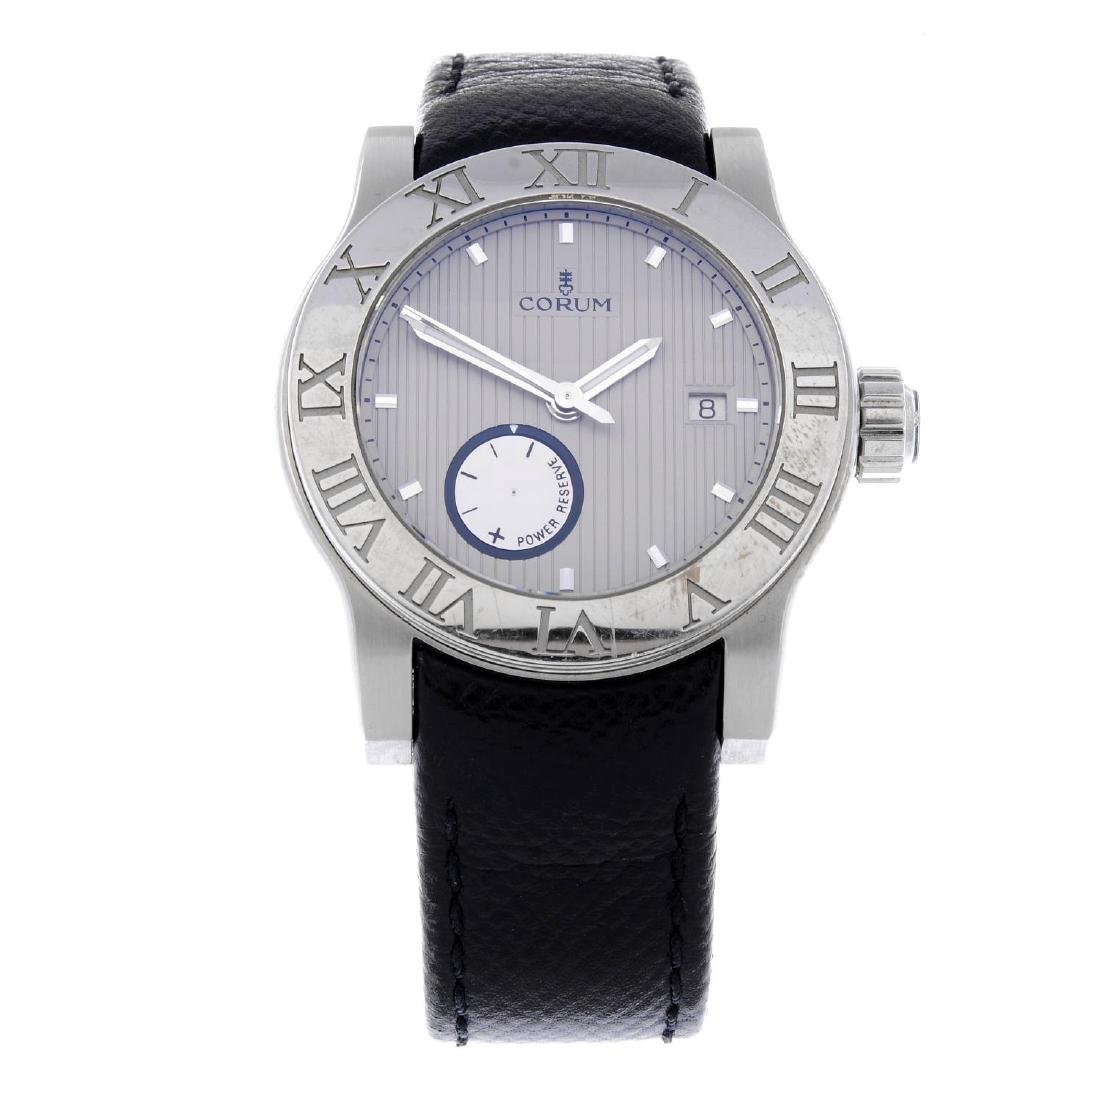 CORUM - a gentleman's Romulus wrist watch. Stainless